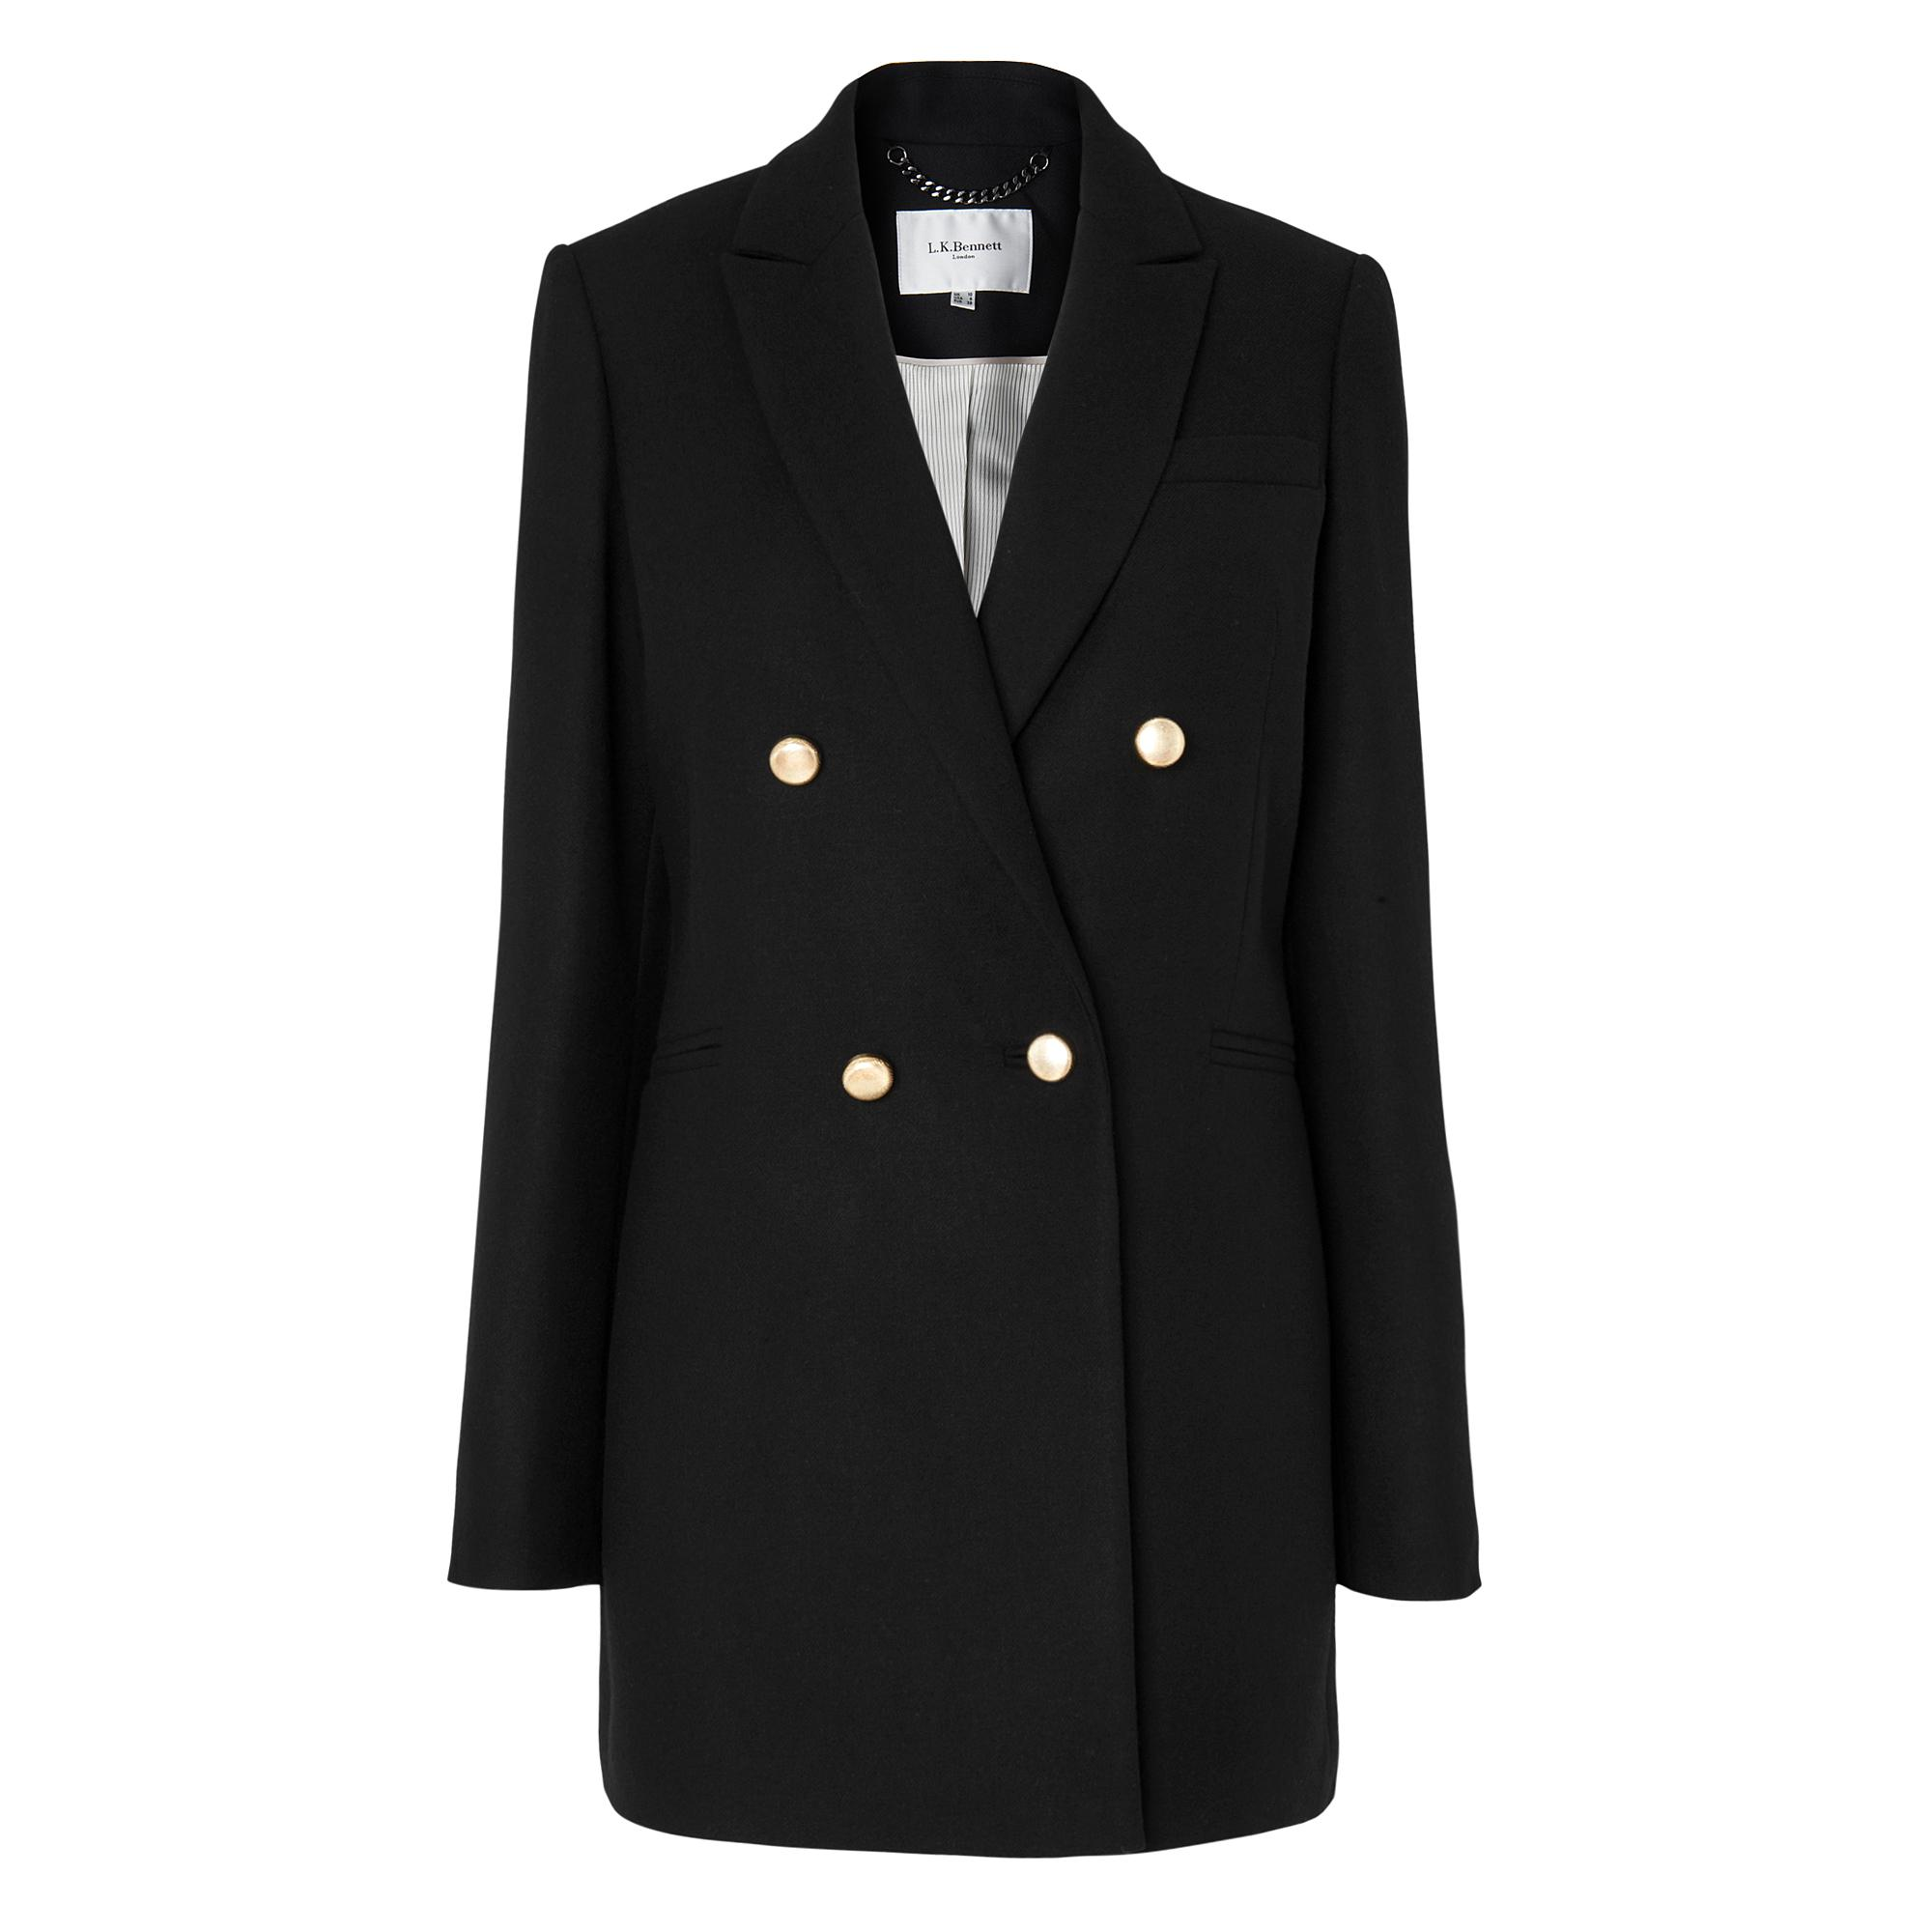 Ursula Double Breasted Jacket